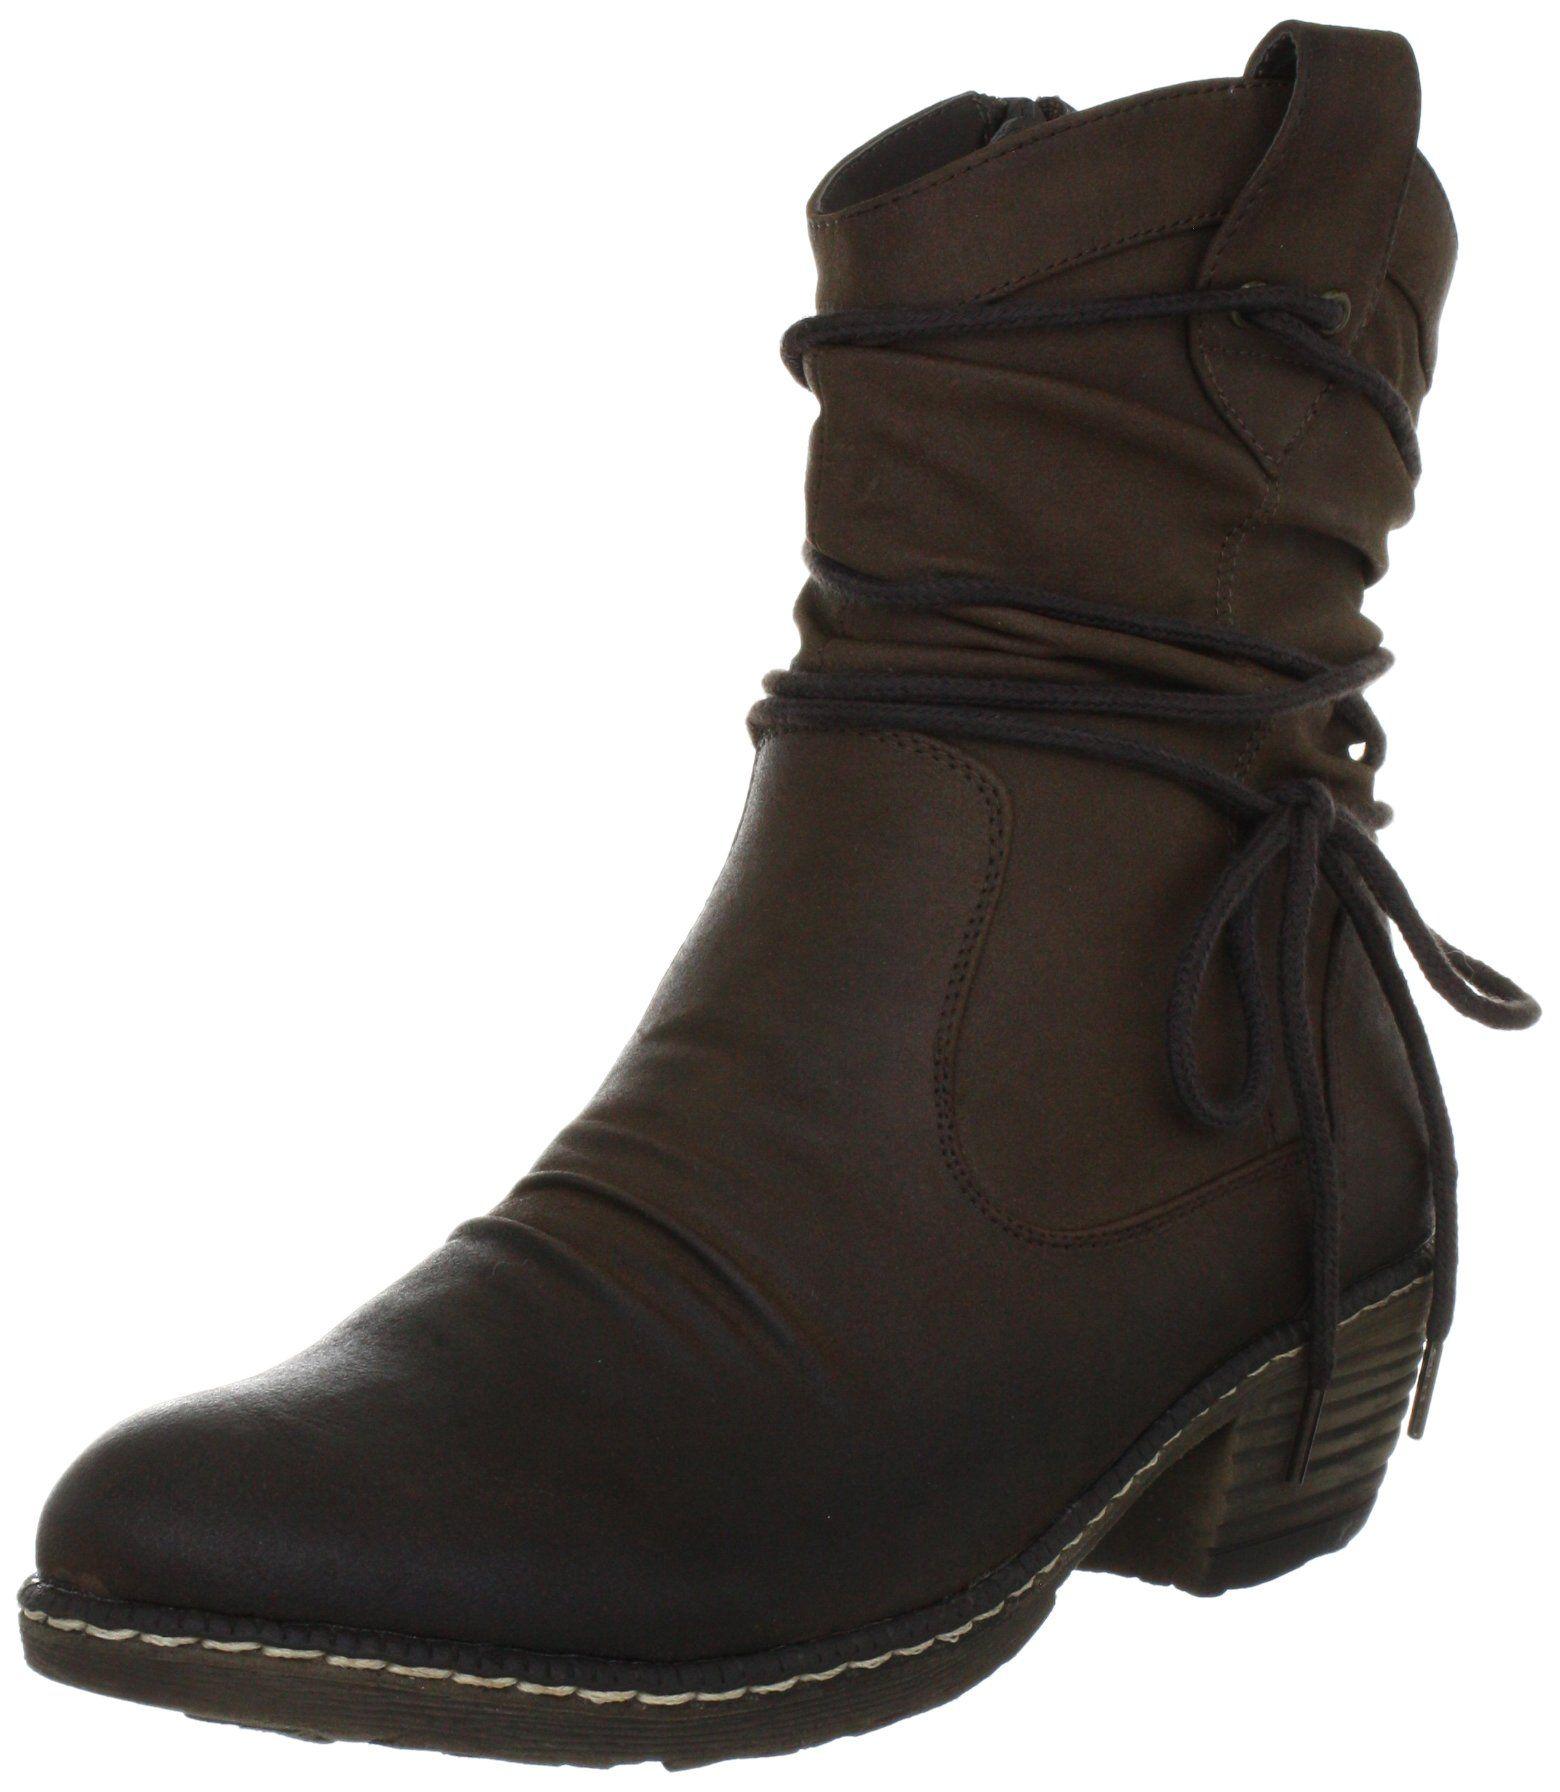 Rieker Womens 93754 Cowboy Boots | Shoes | Boots, Cowboy